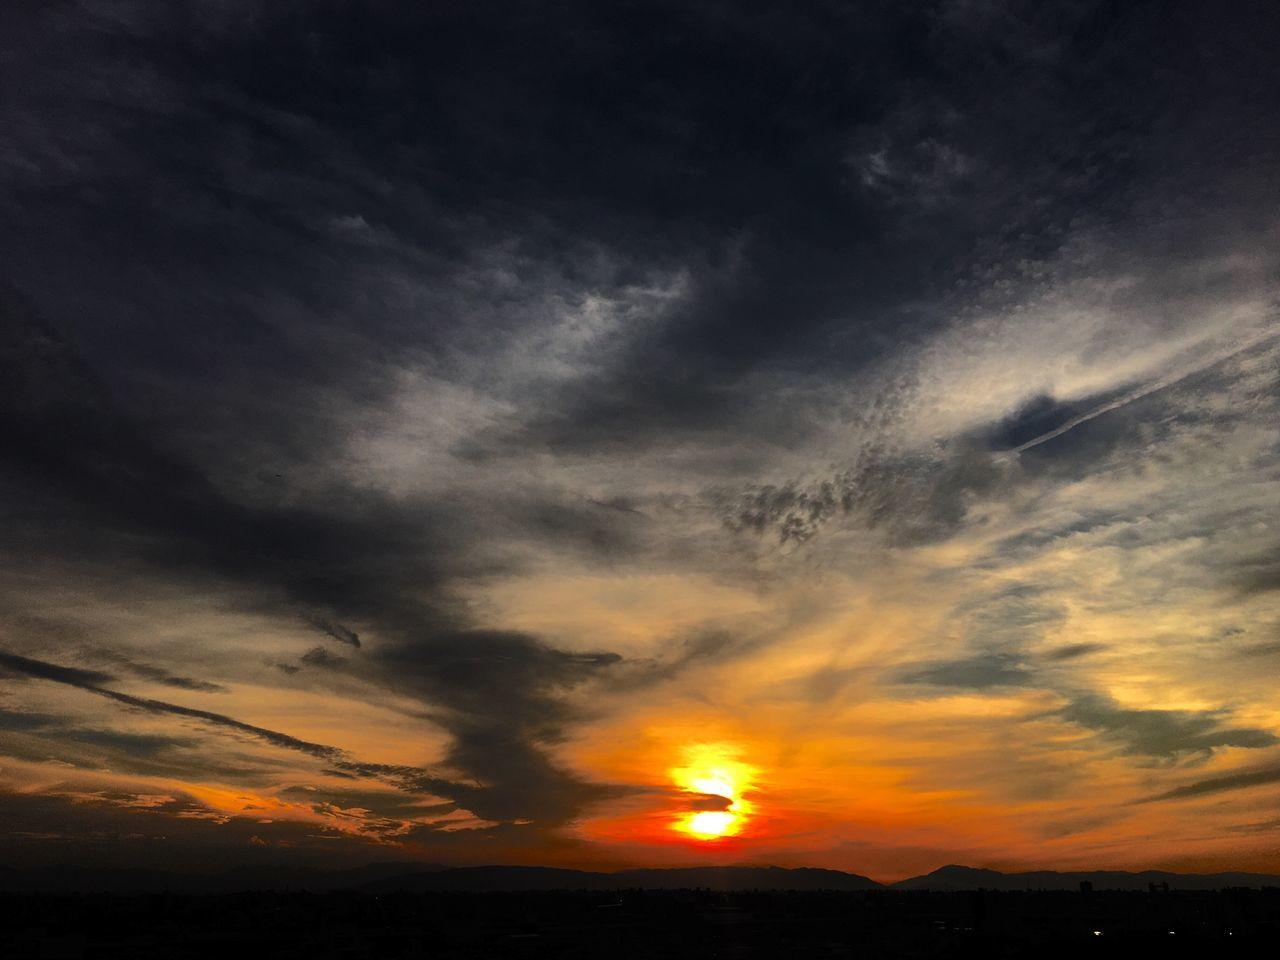 sunset, orange color, beauty in nature, nature, scenics, dramatic sky, tranquility, sky, tranquil scene, majestic, cloud - sky, silhouette, sun, idyllic, no people, outdoors, landscape